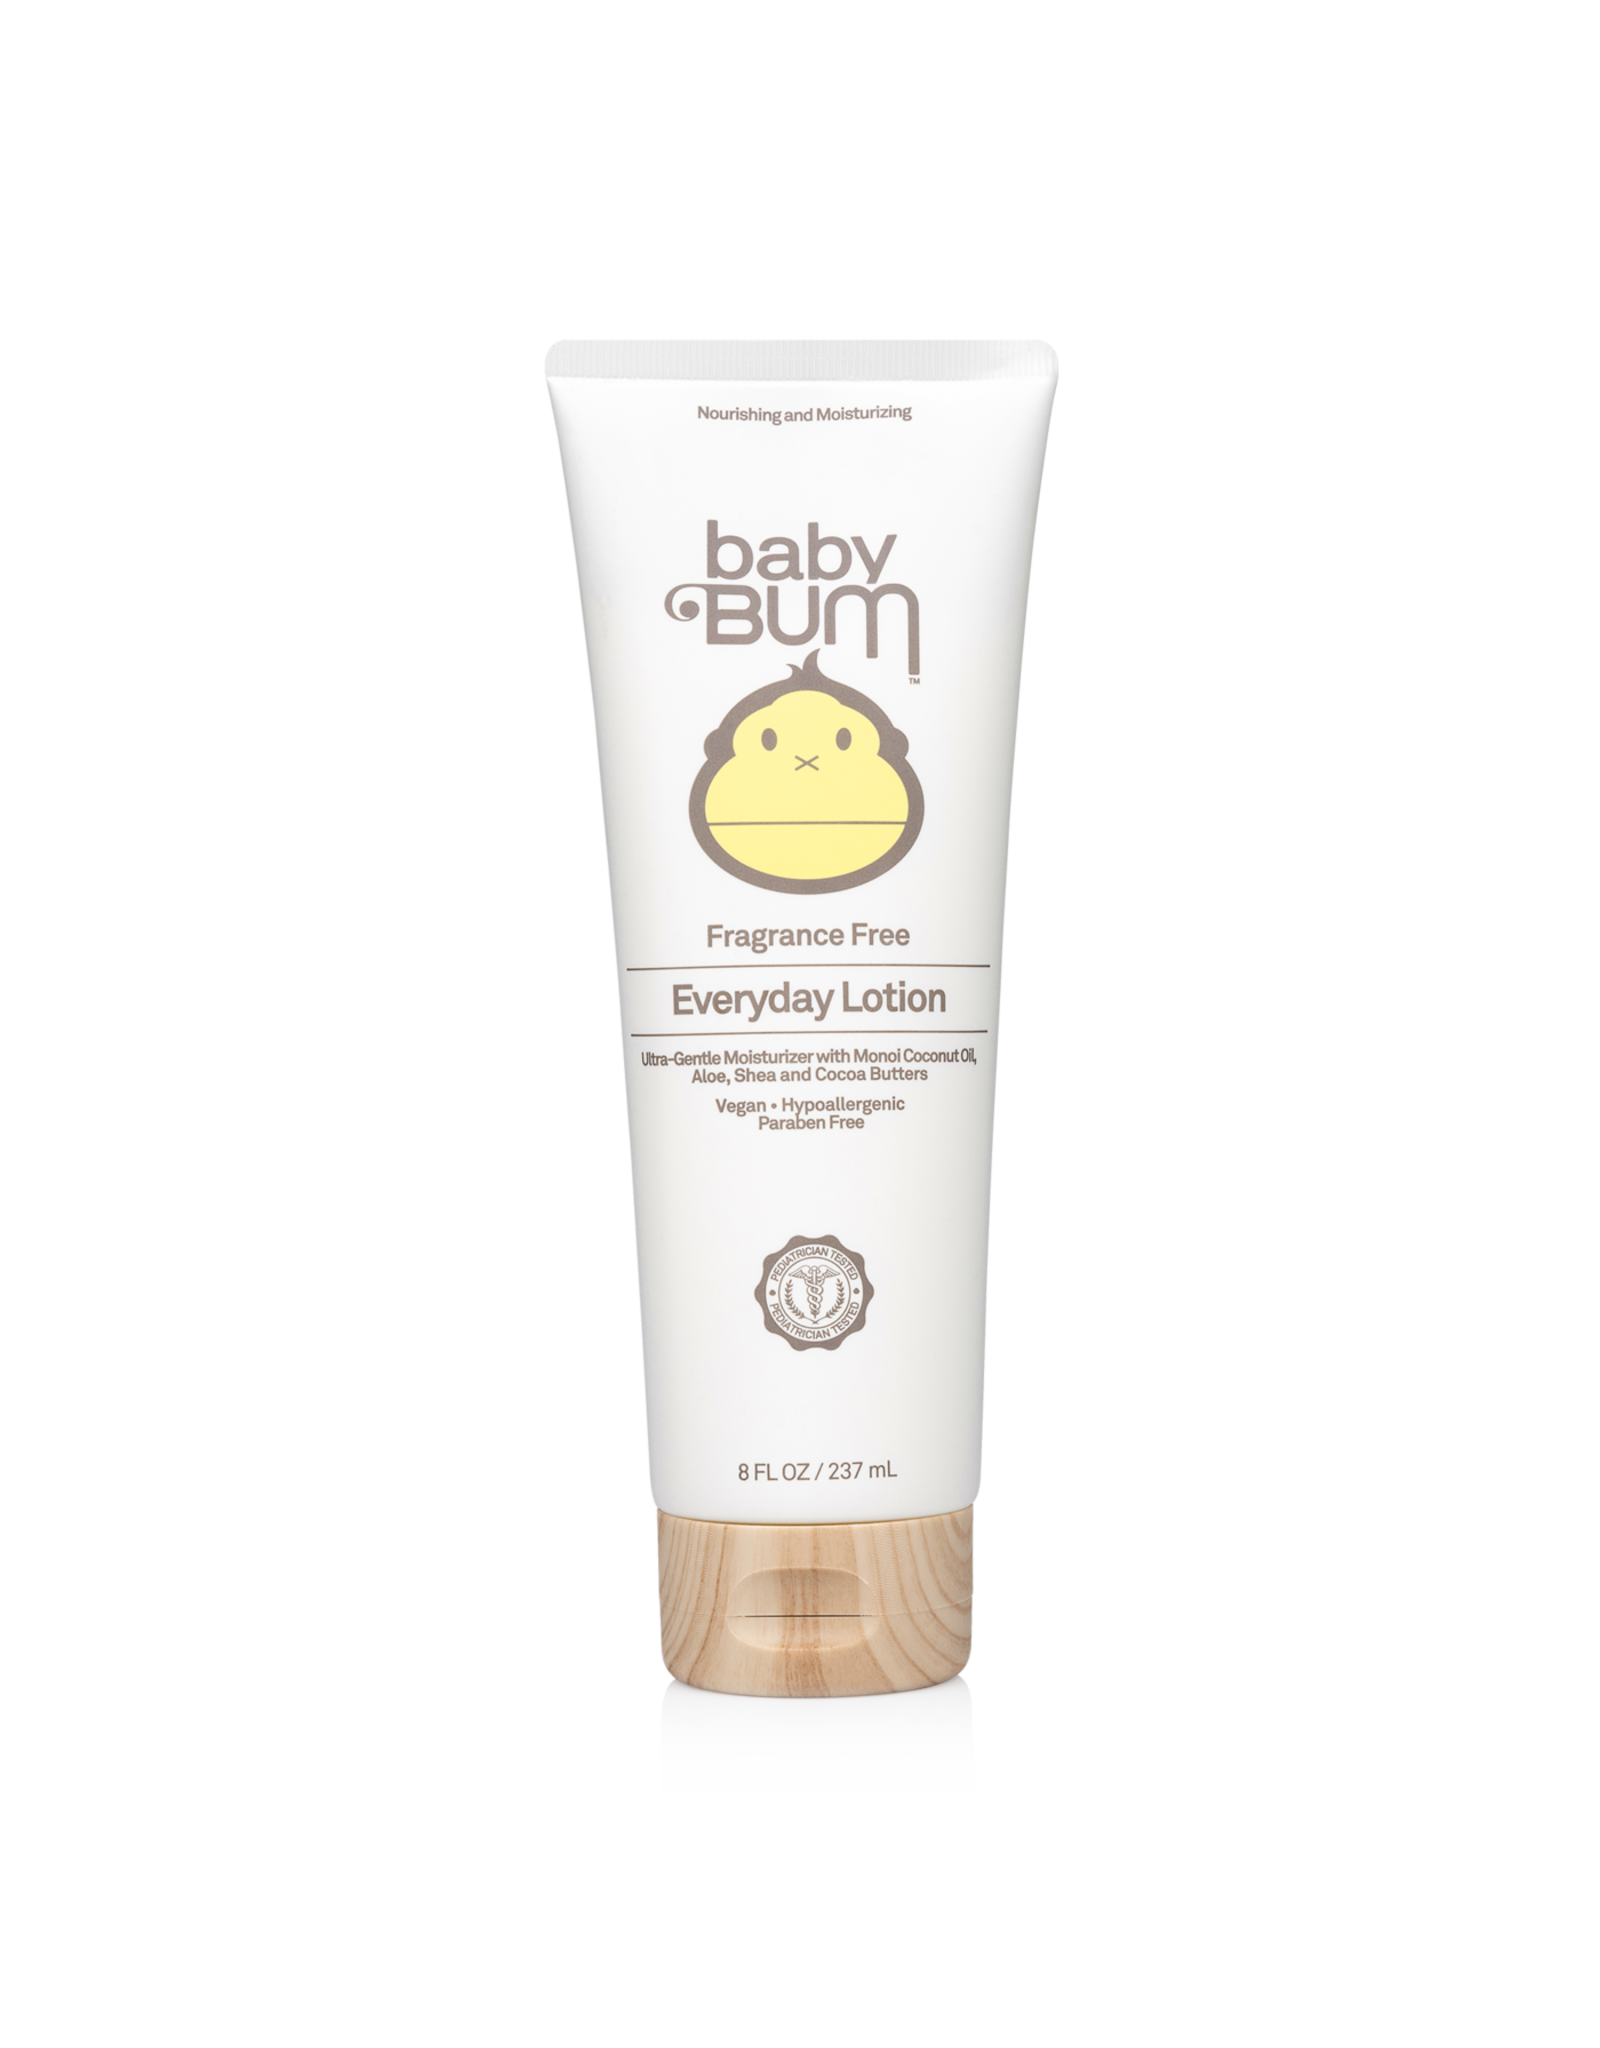 SUN BUM Baby Bum Everyday Lotion - Fragrance Free